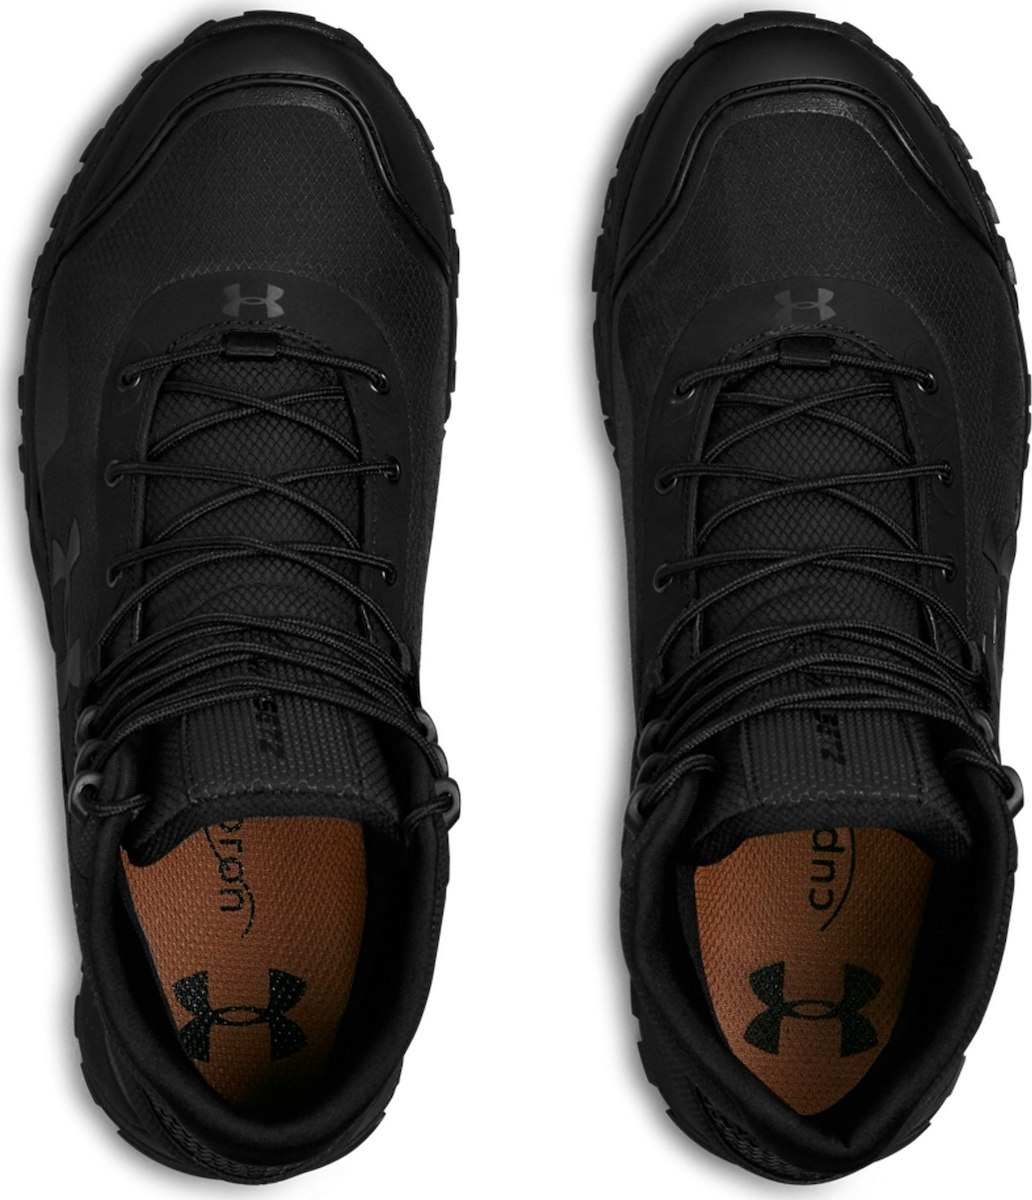 7c9ab2dbf6a botas tacticas  under armour valsetz 1.5 rts  color negro. Cargando zoom.